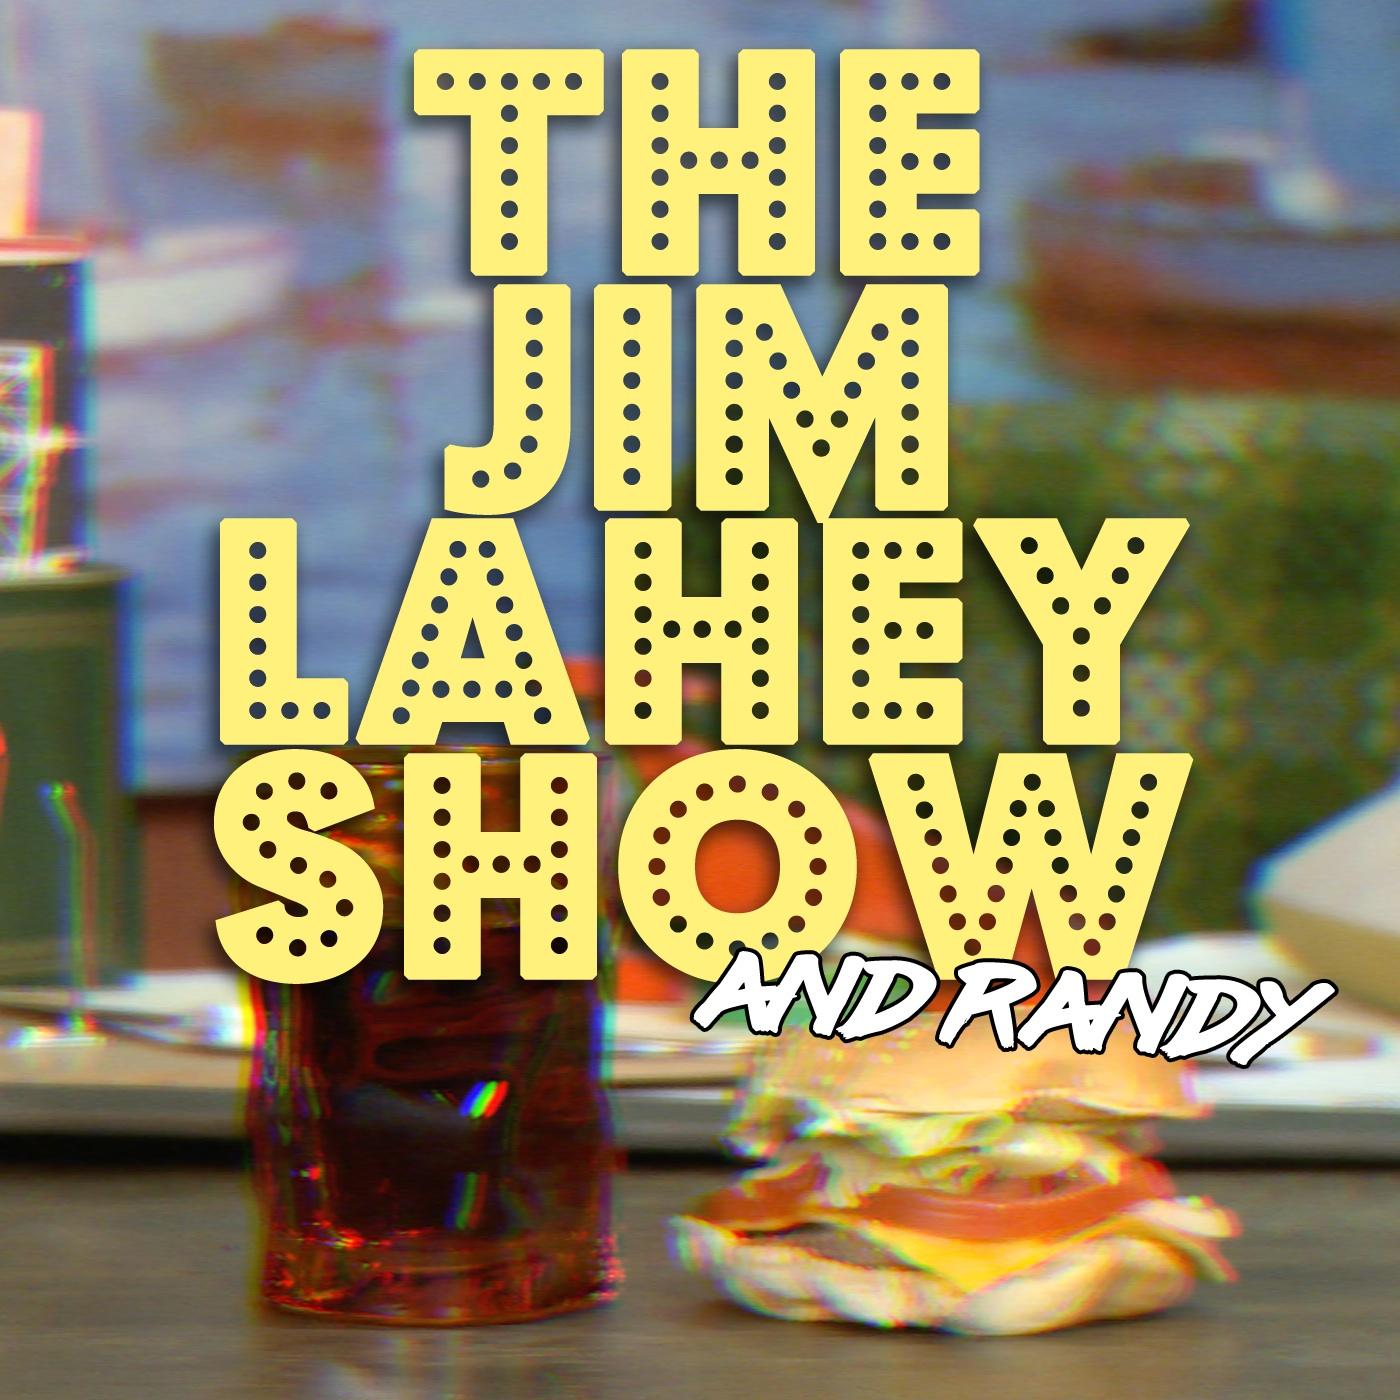 The Jim Lahey Show & Randy show art